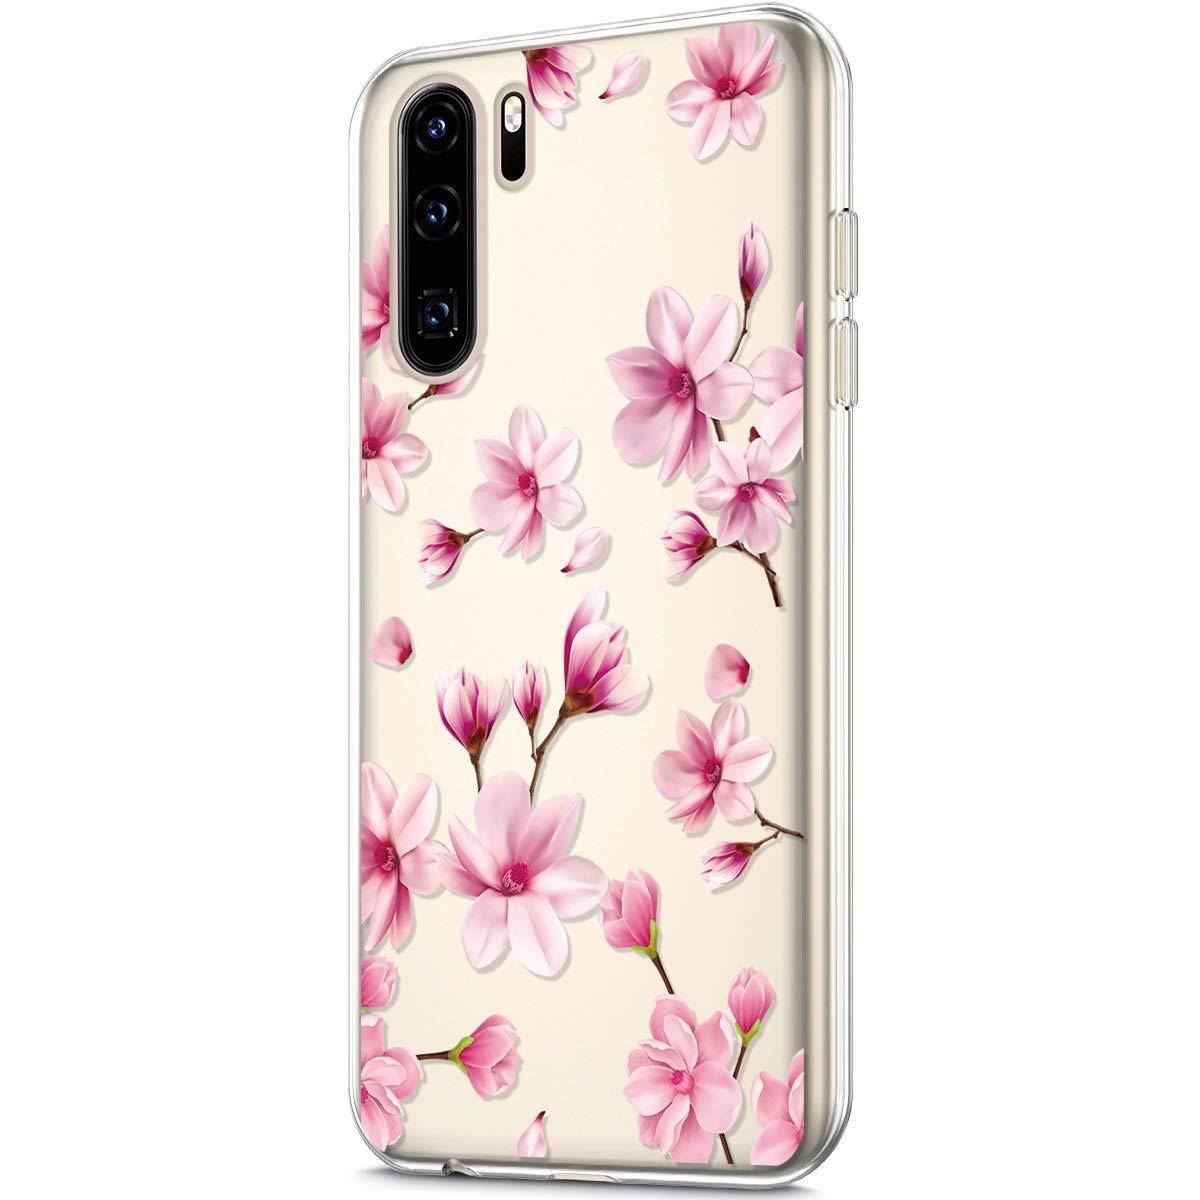 Funda Compatible con Huawei P30 Pro,Carcasa KunyFond Calidad Silicona Frame TPU Suave Simple Transparente Pintura Pintado Impresion Colores Flores Premium Vistoso Case Dura Dif/ícil Bumper,Mandala